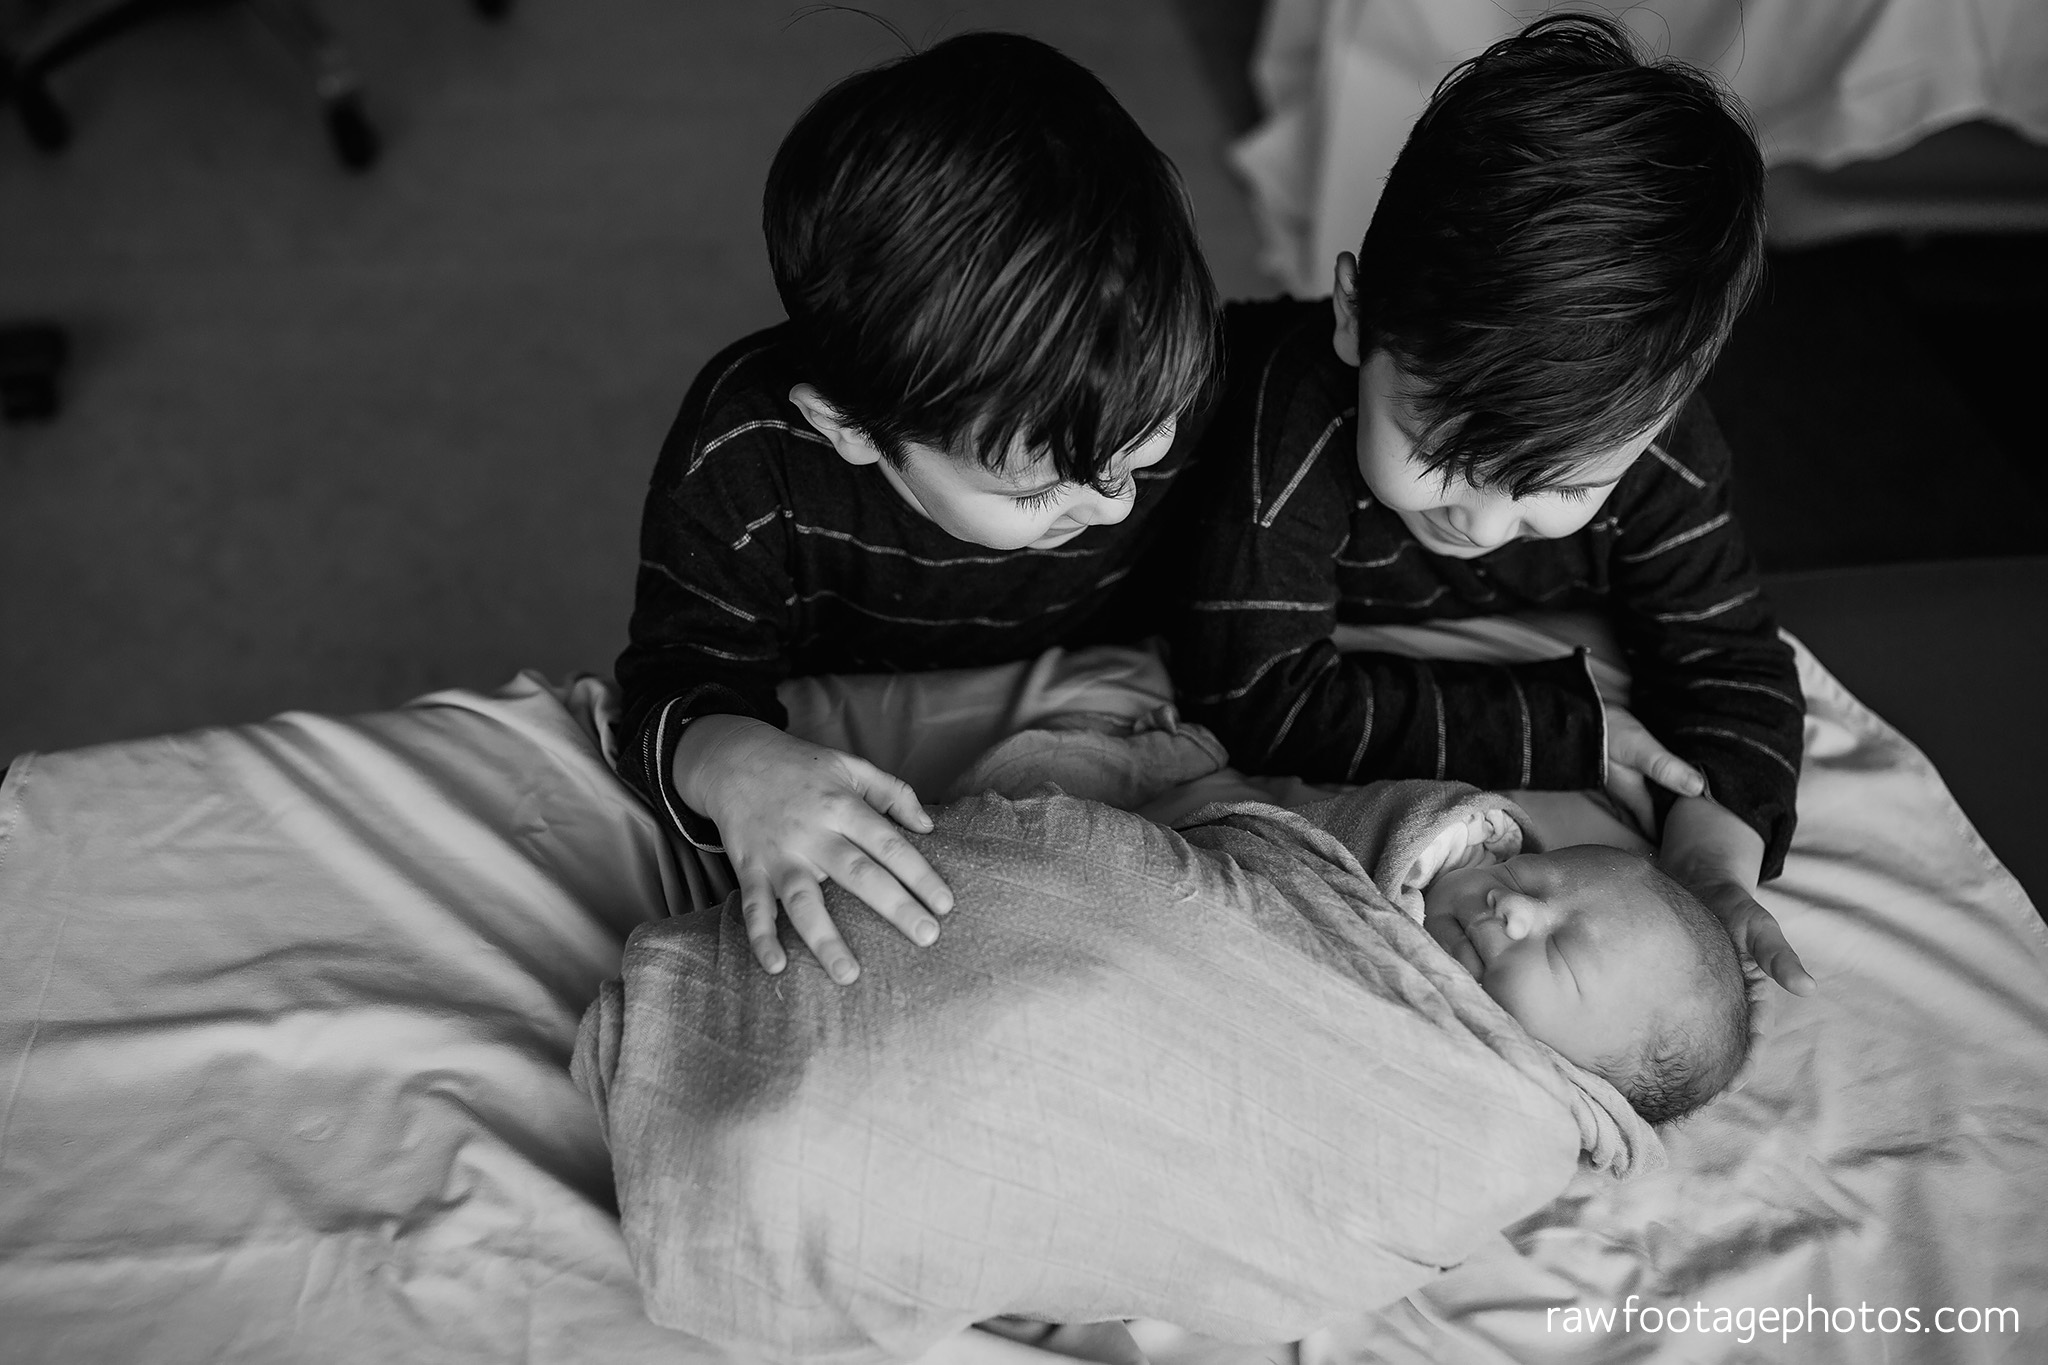 london_ontario_newborn_lifestyle_photographer-best_of_2018-raw_footage_photography034.jpg